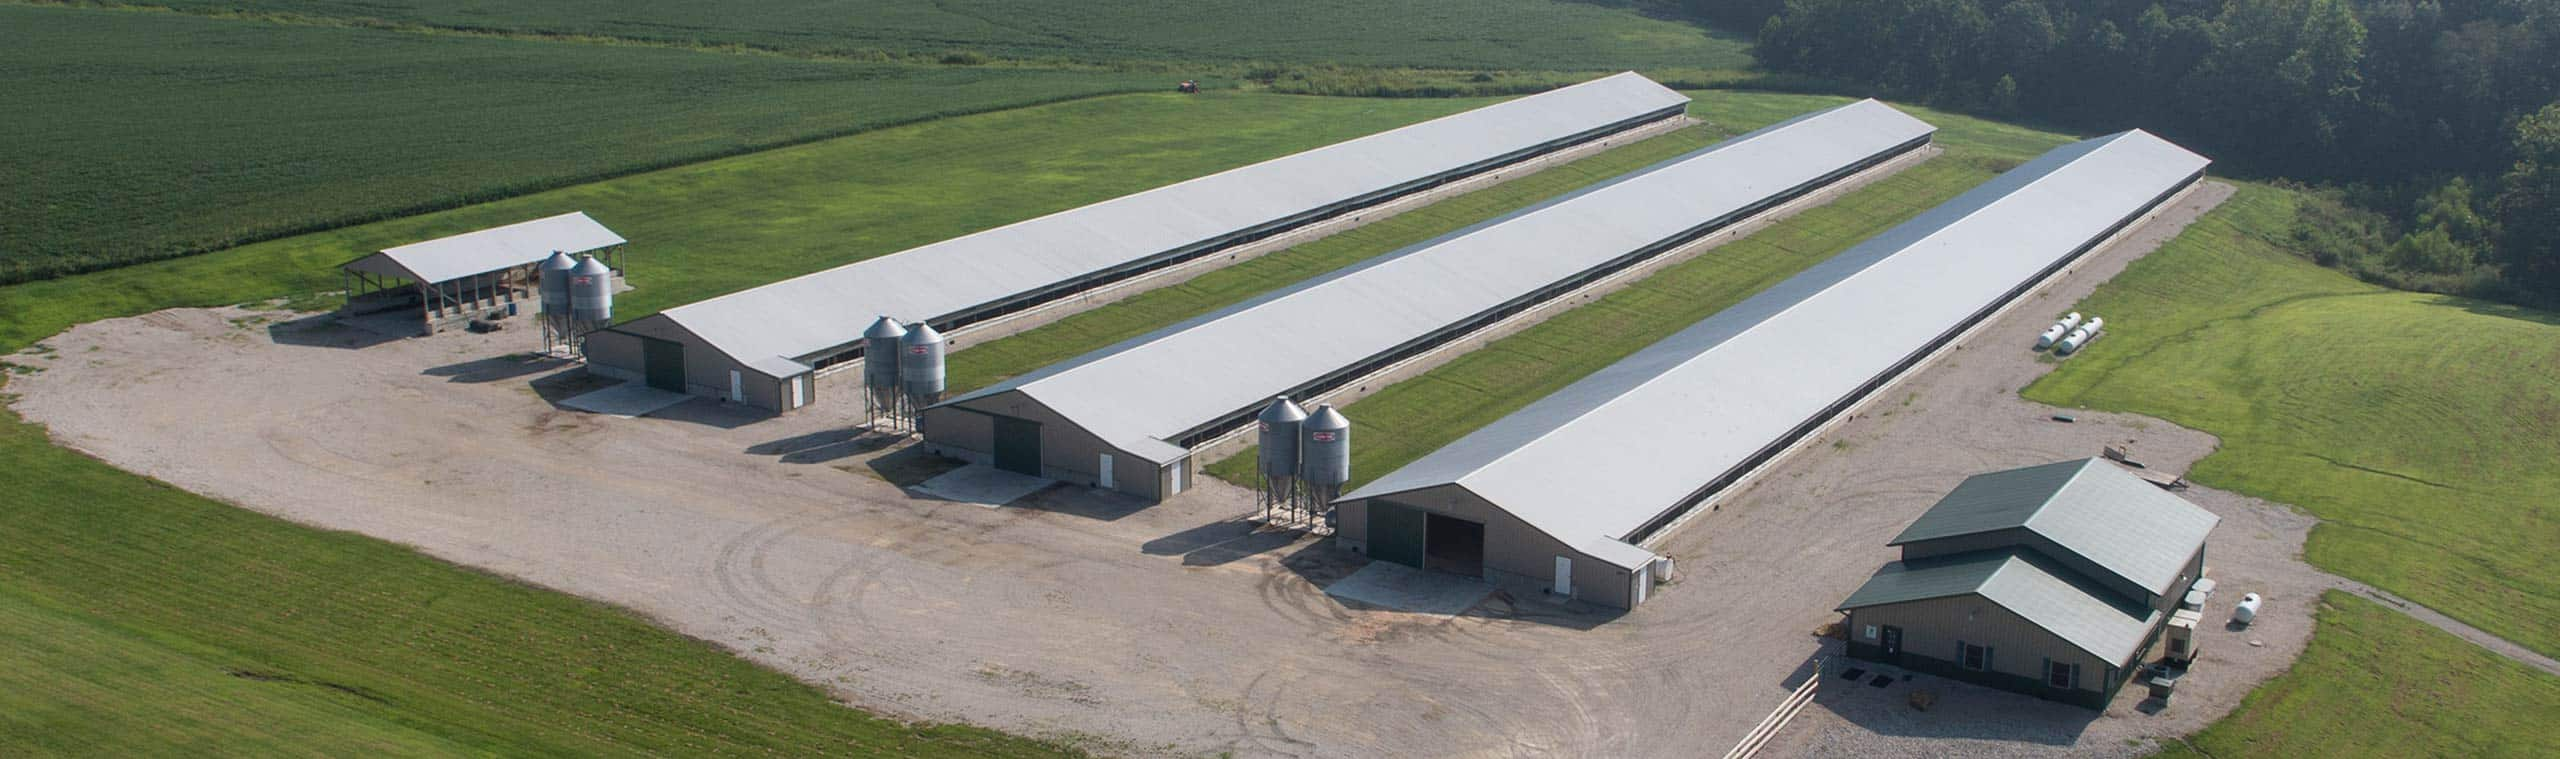 Farbest Farms Brooding Hubs